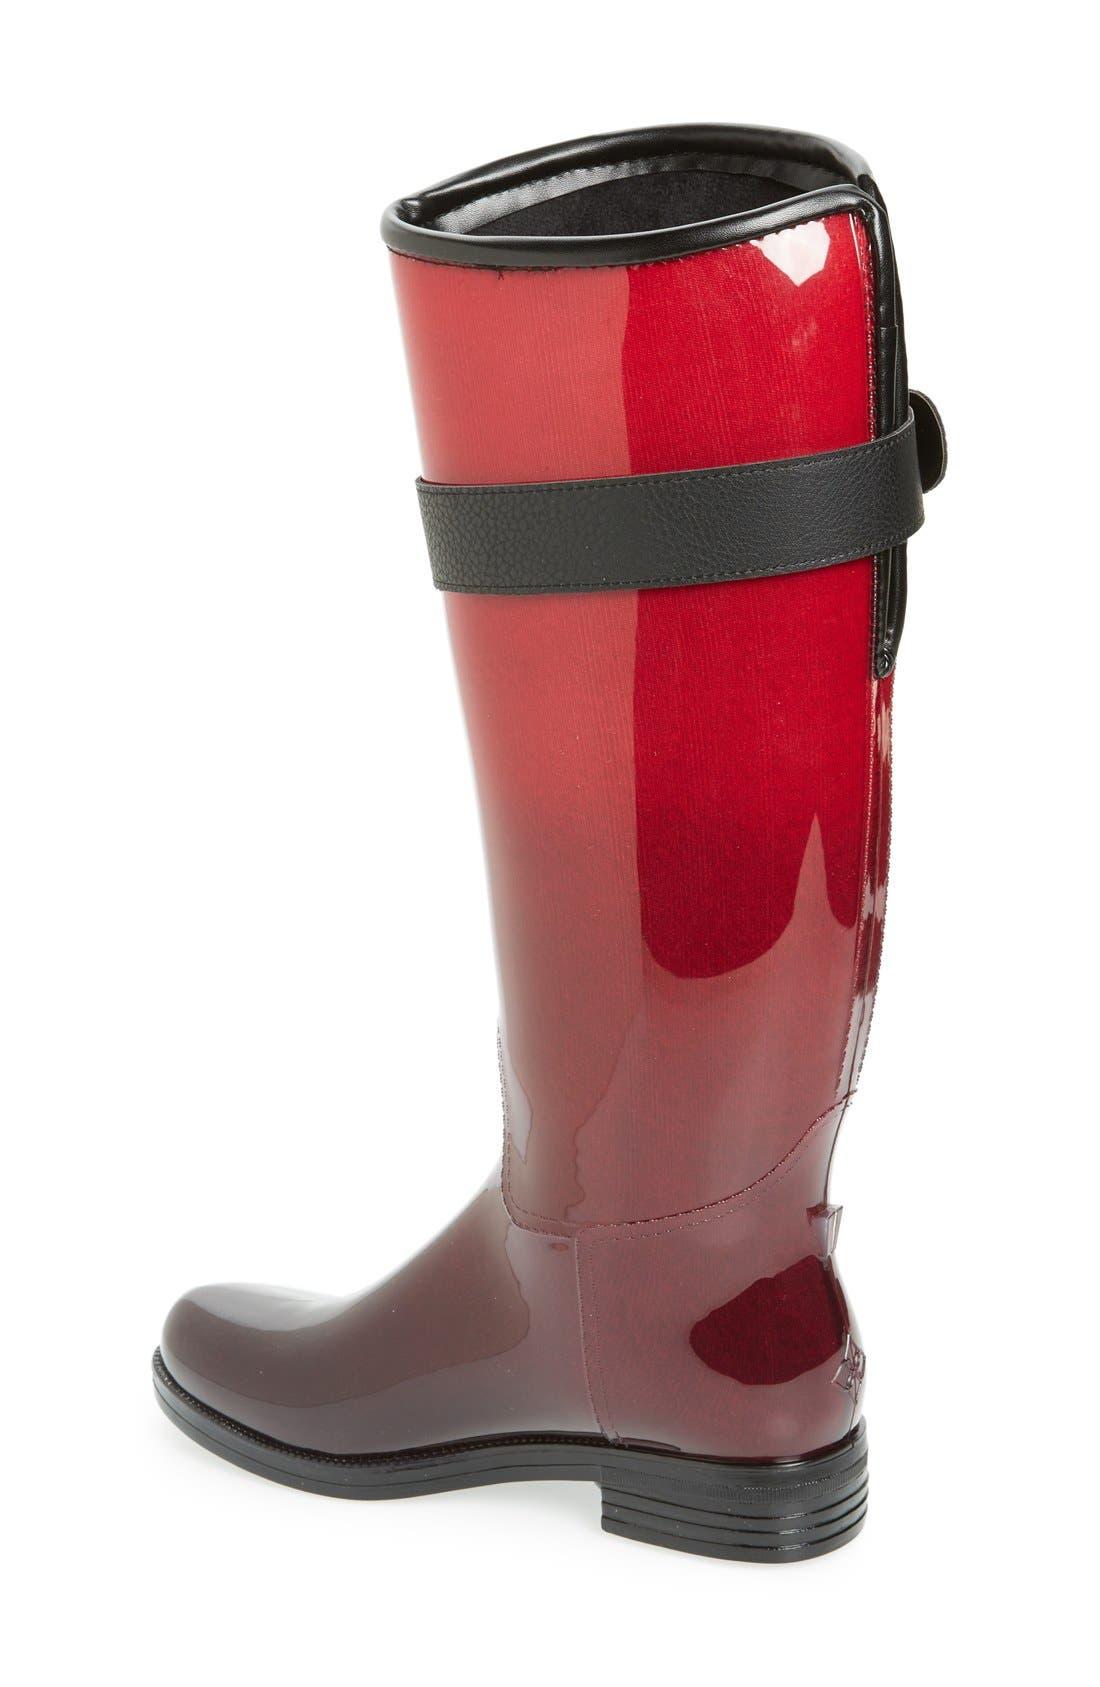 Alternate Image 2  - däv 'Bristol' Weatherproof Knee High Rain Boot (Women)